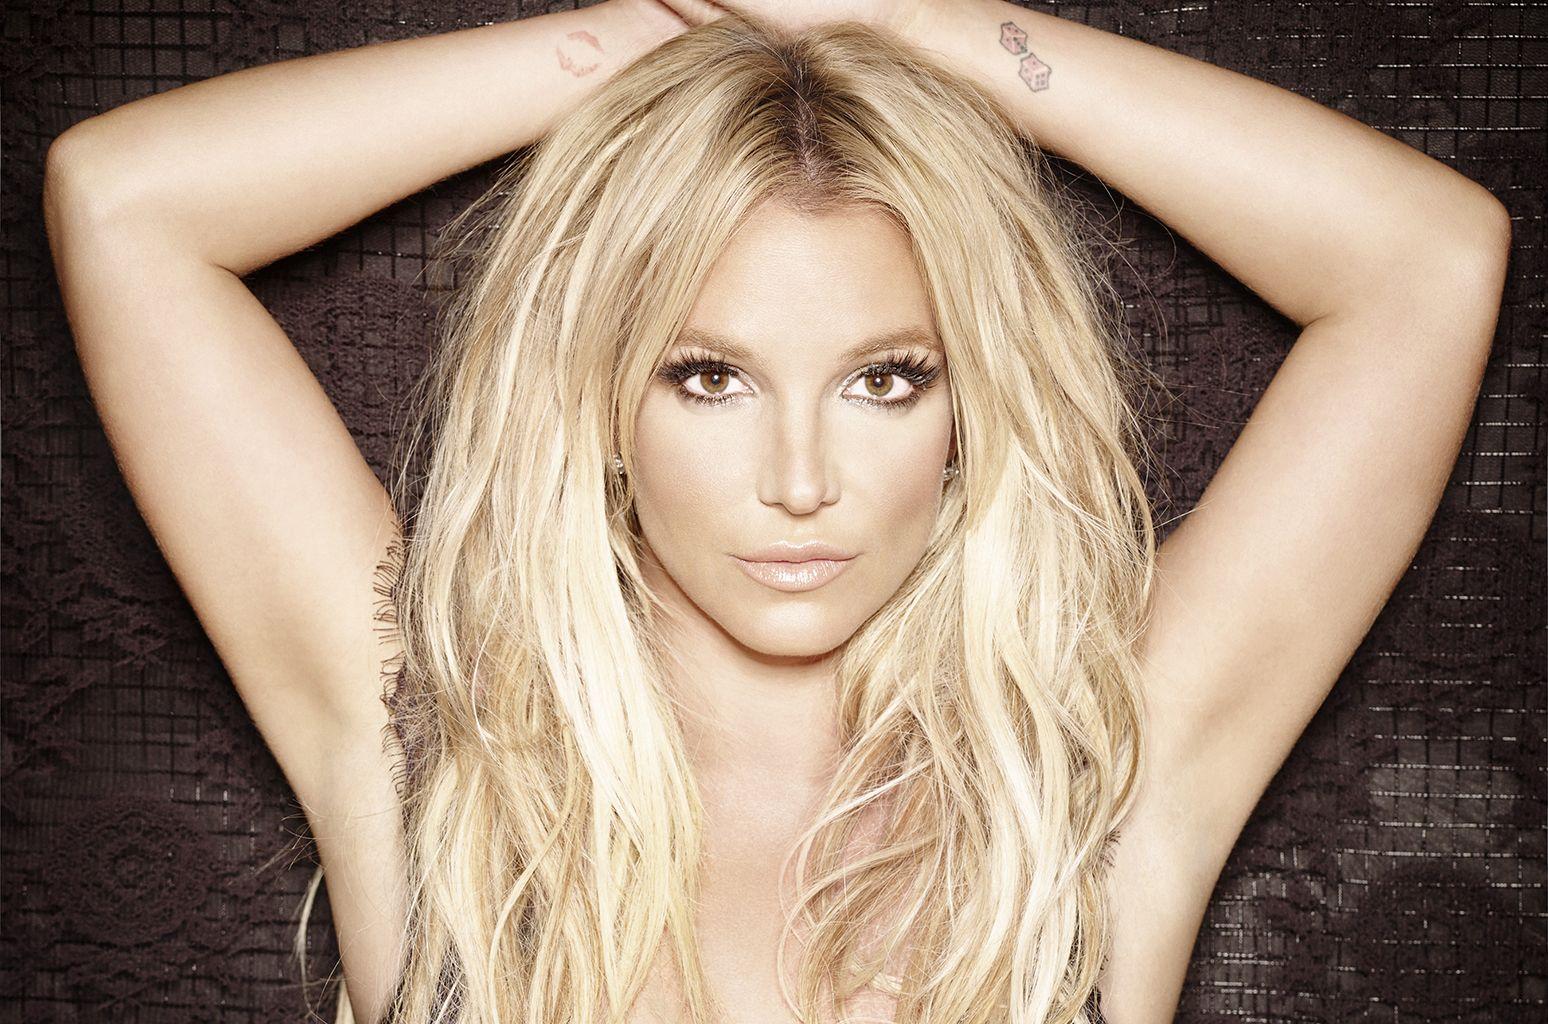 5. La nuova Britney